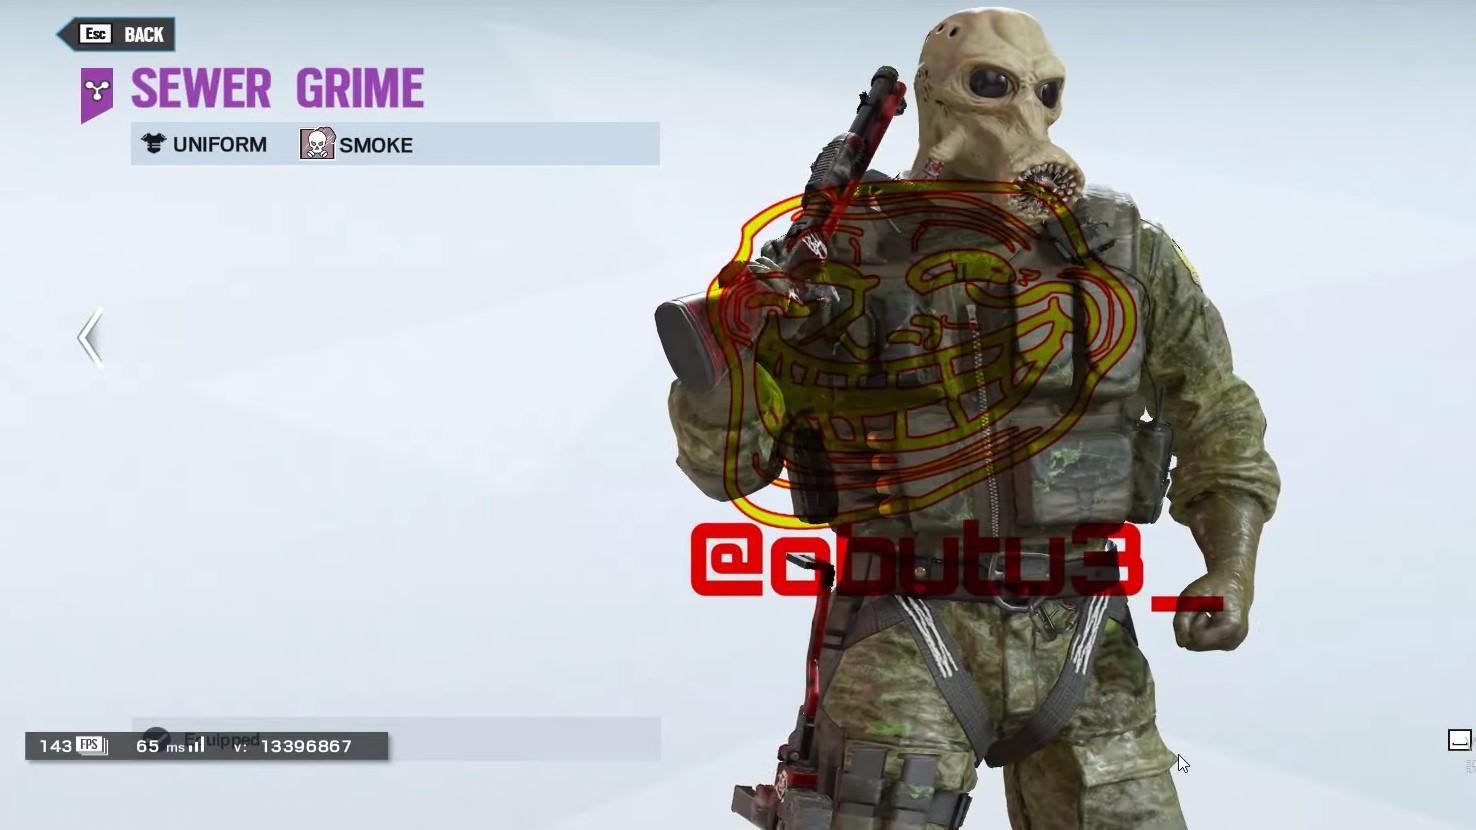 Halloween Skins Rainbow Six Siege 2020 Rainbow Six Siege's Halloween skins appear to have leaked | PC Gamer